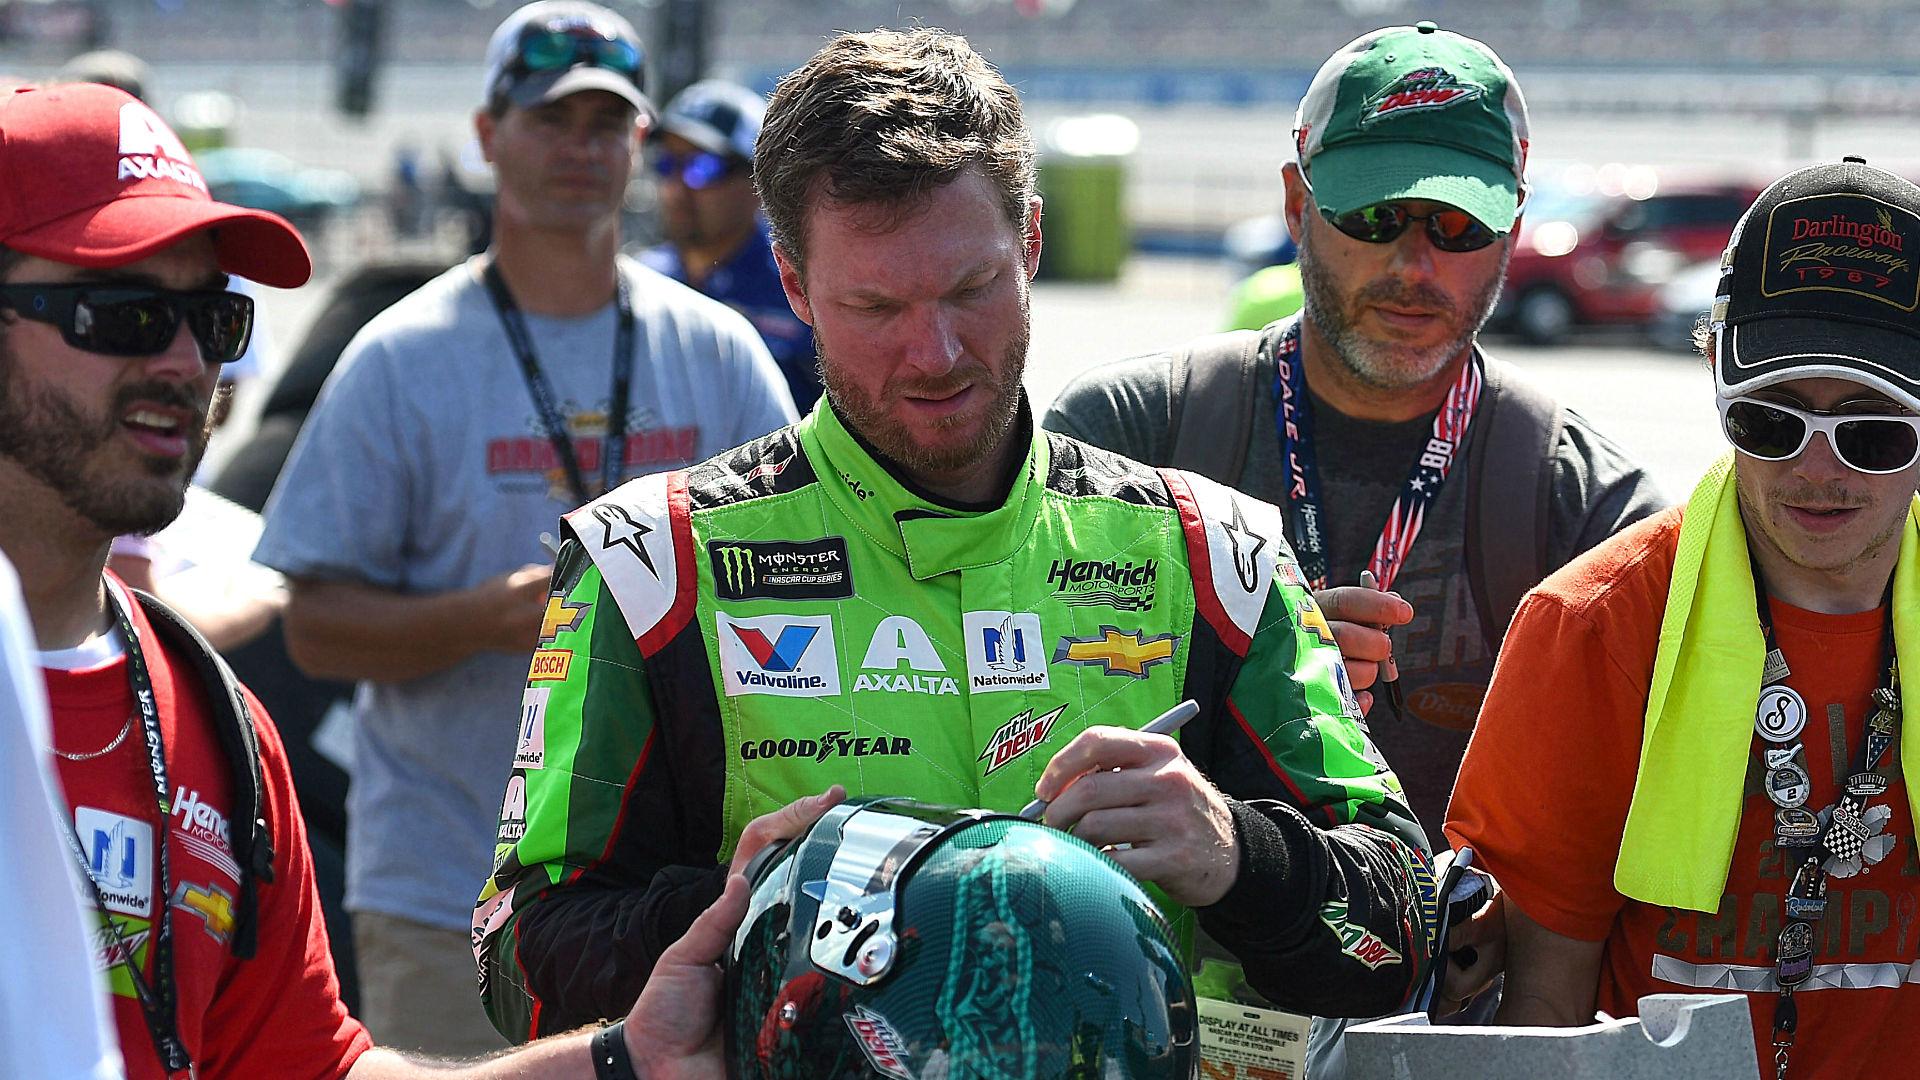 NASCAR starting lineup at Talladega: Dale Earnhardt Jr. captures pole for final 'Dega start